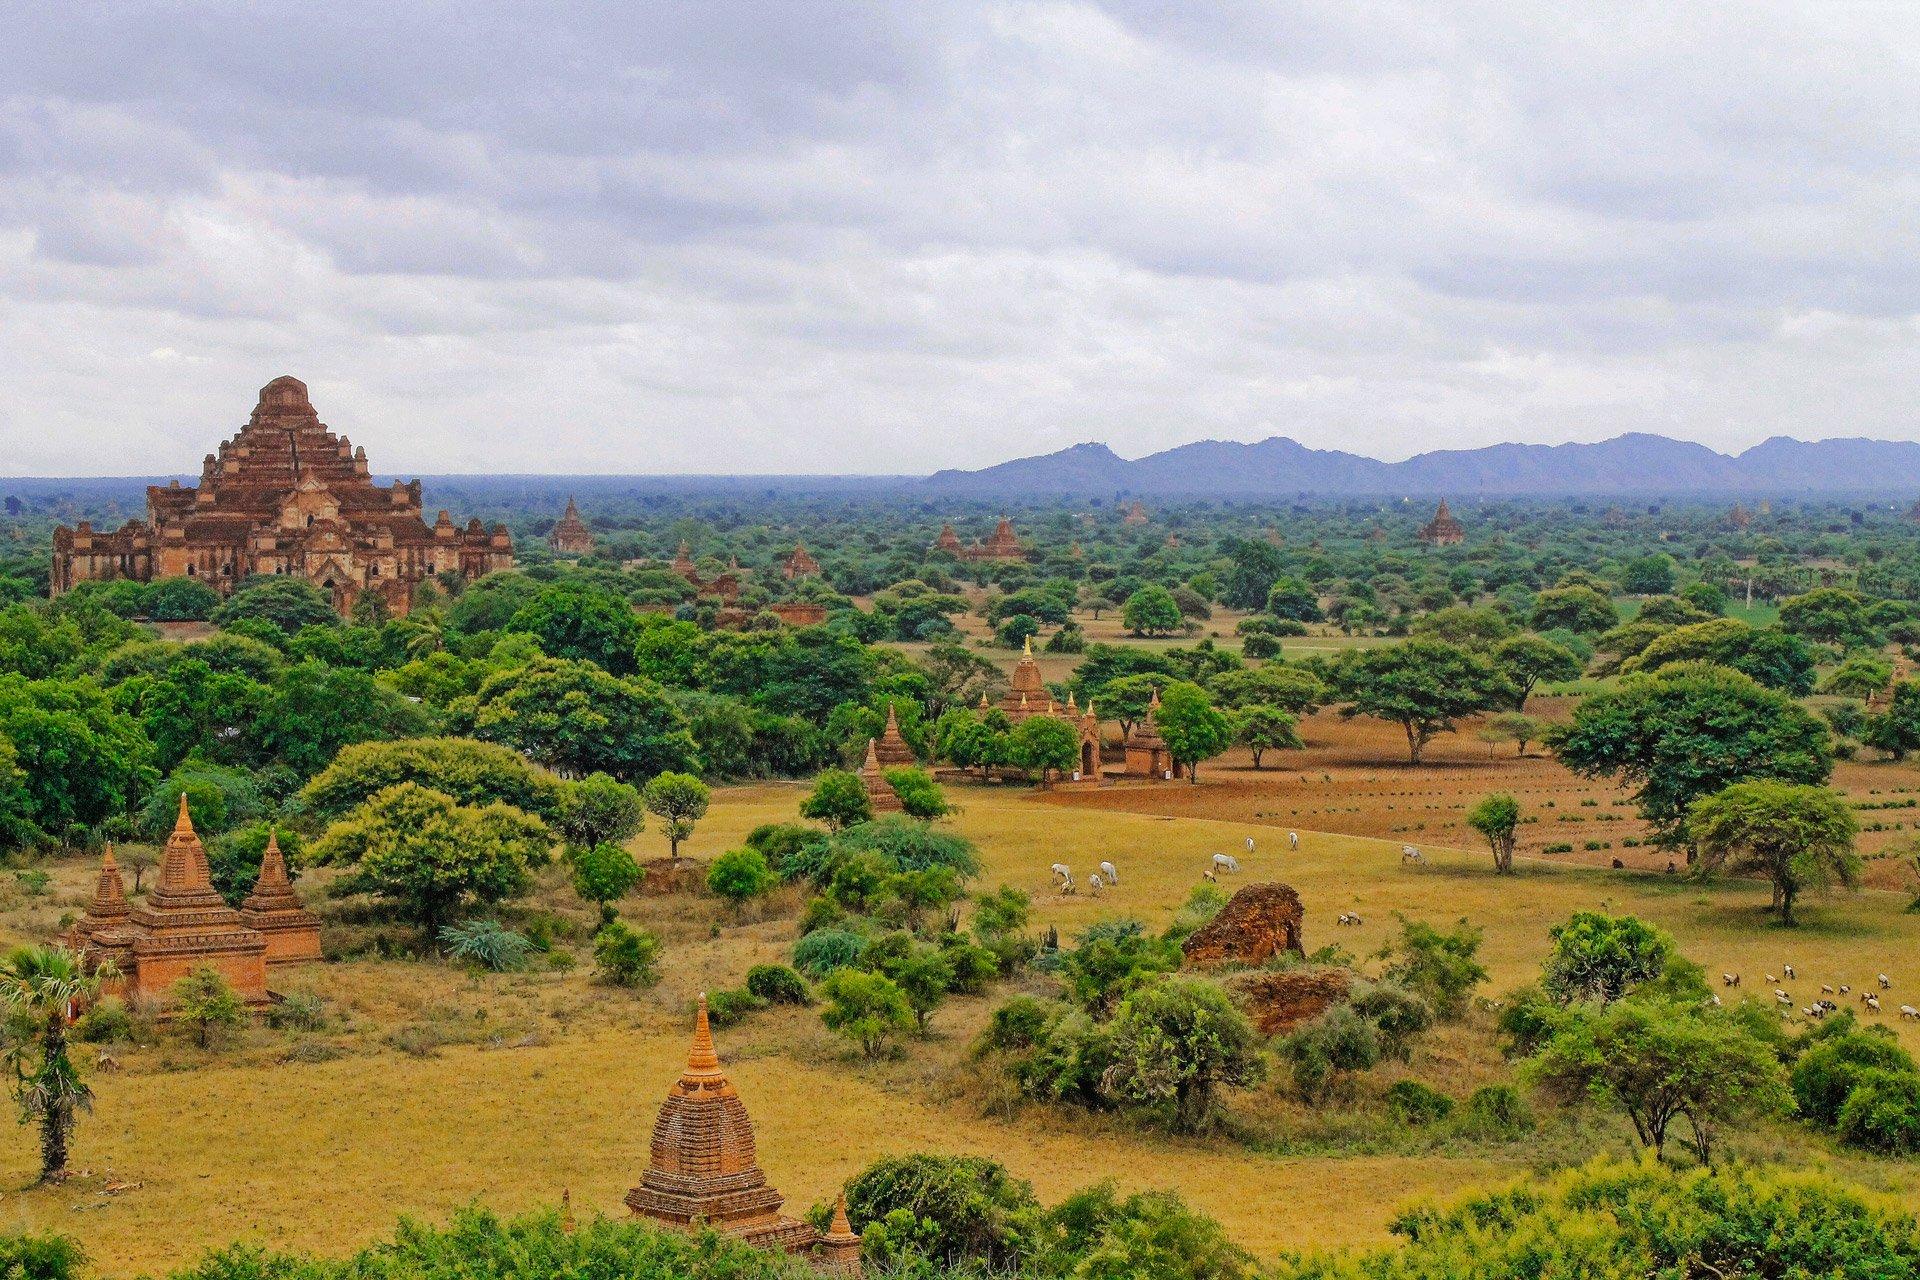 myanmar-travel-guide-2